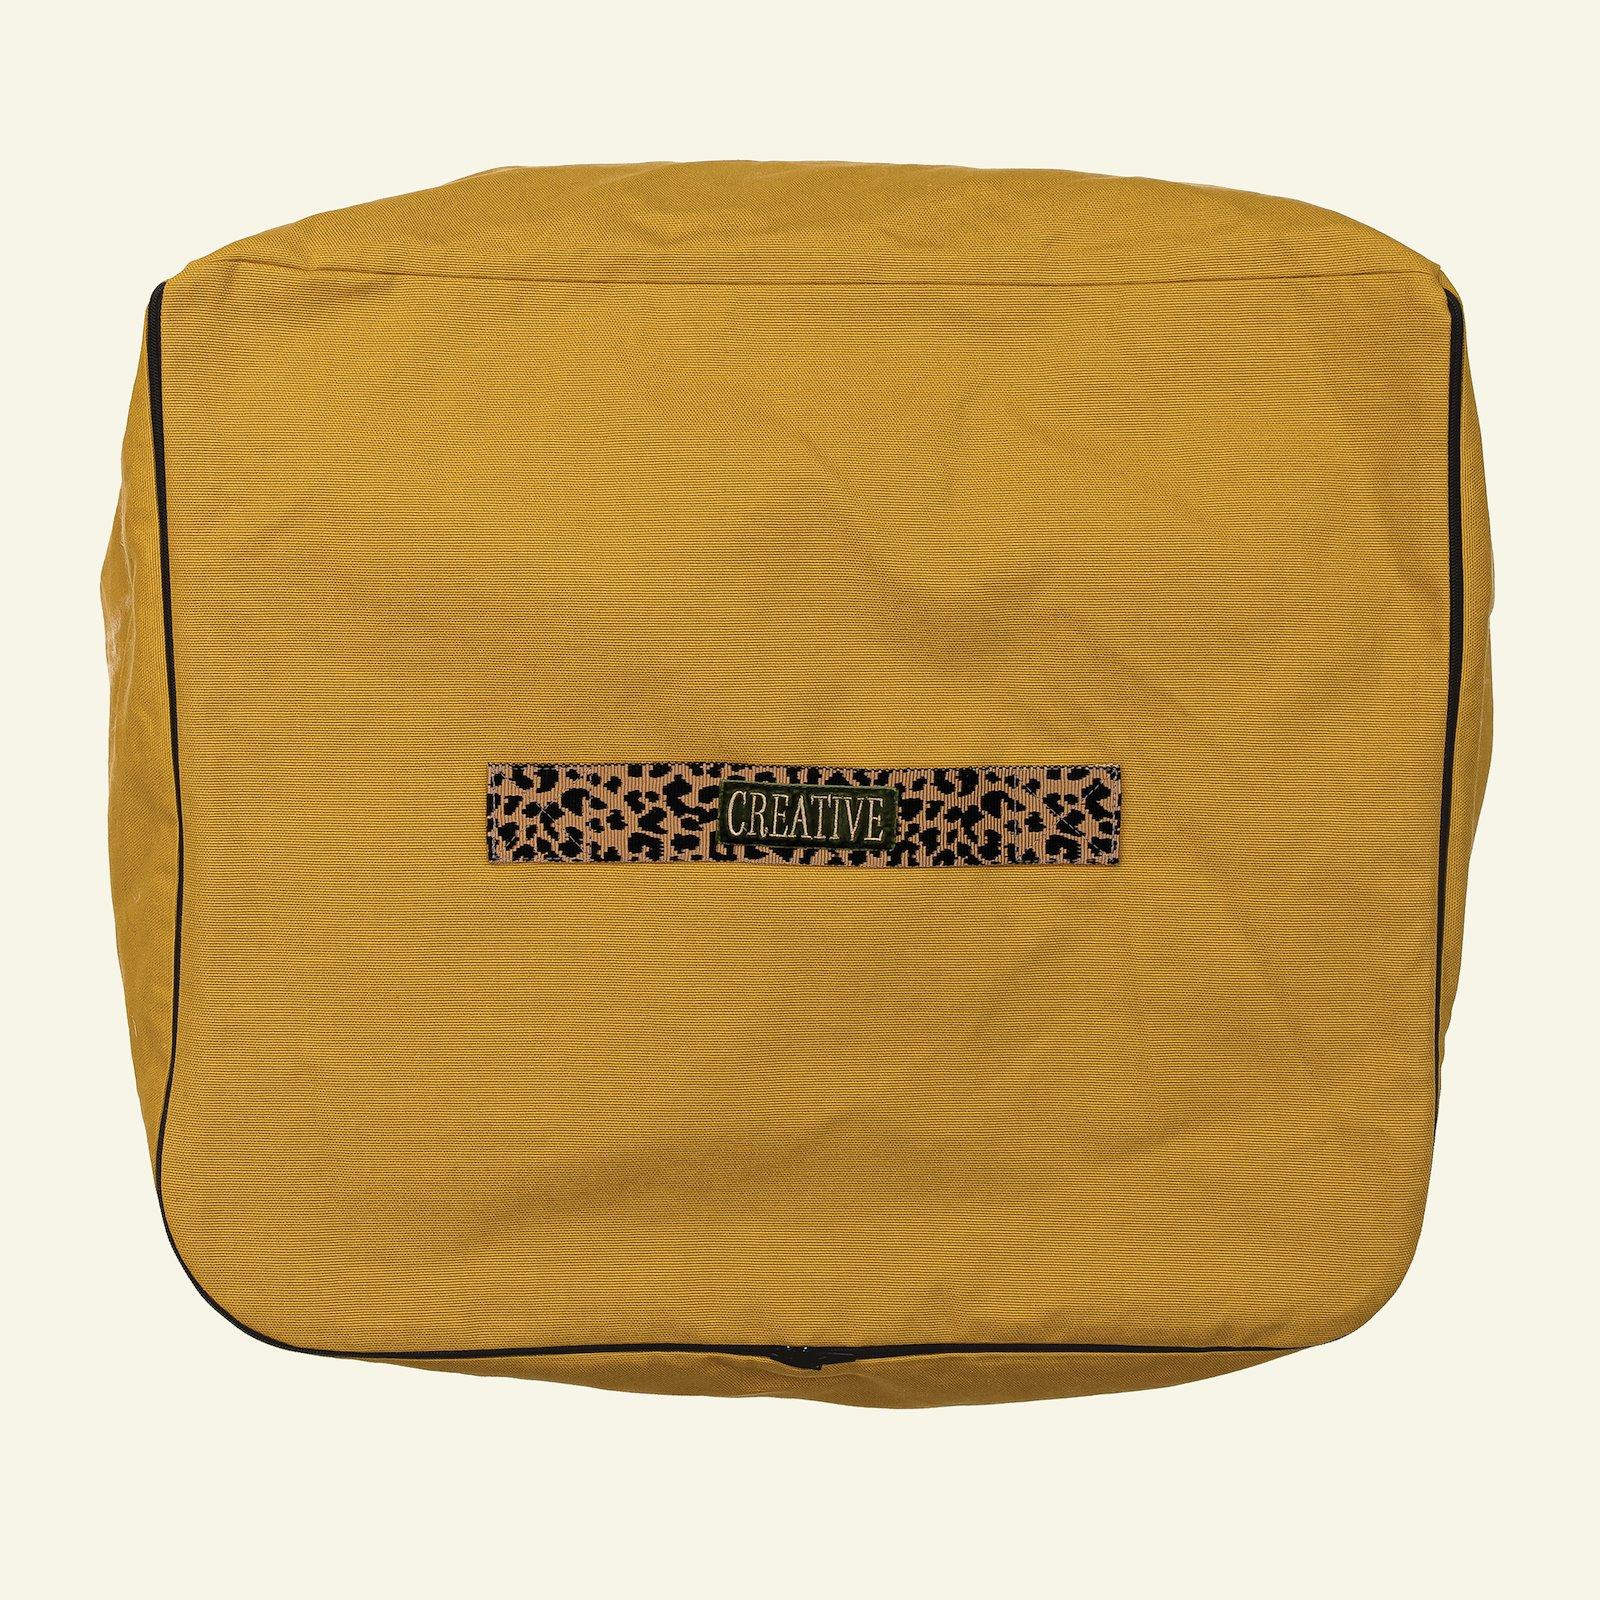 Cotton canvas warm curry p90327_780261_21458_21398_sskit